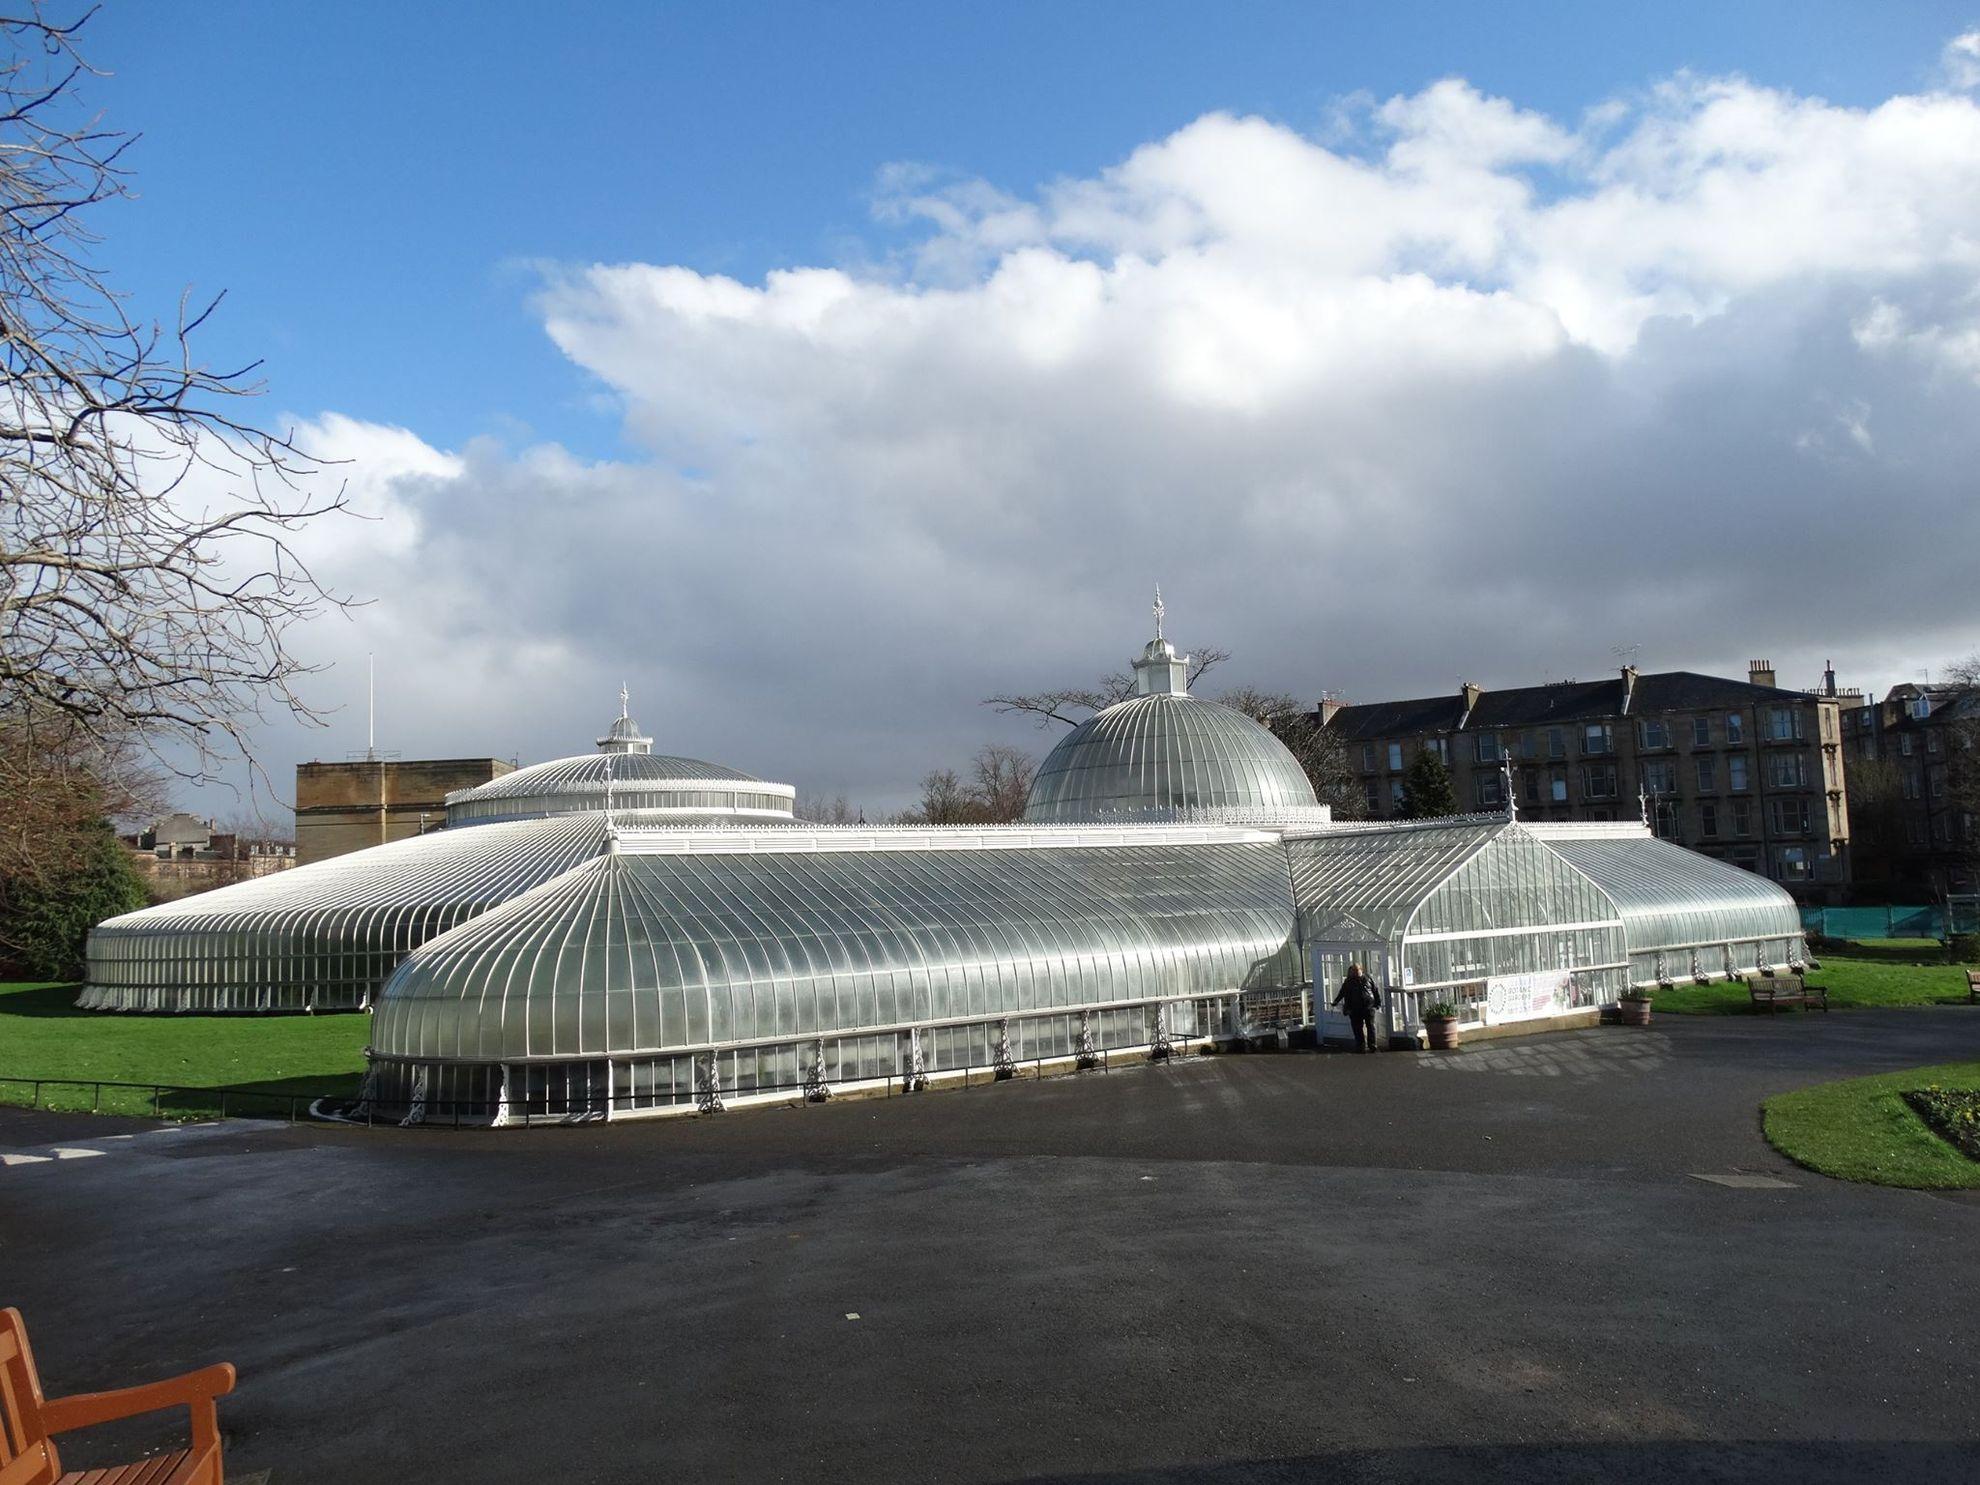 Itinerario di 3 giorni a Glasgow, giardino botanico